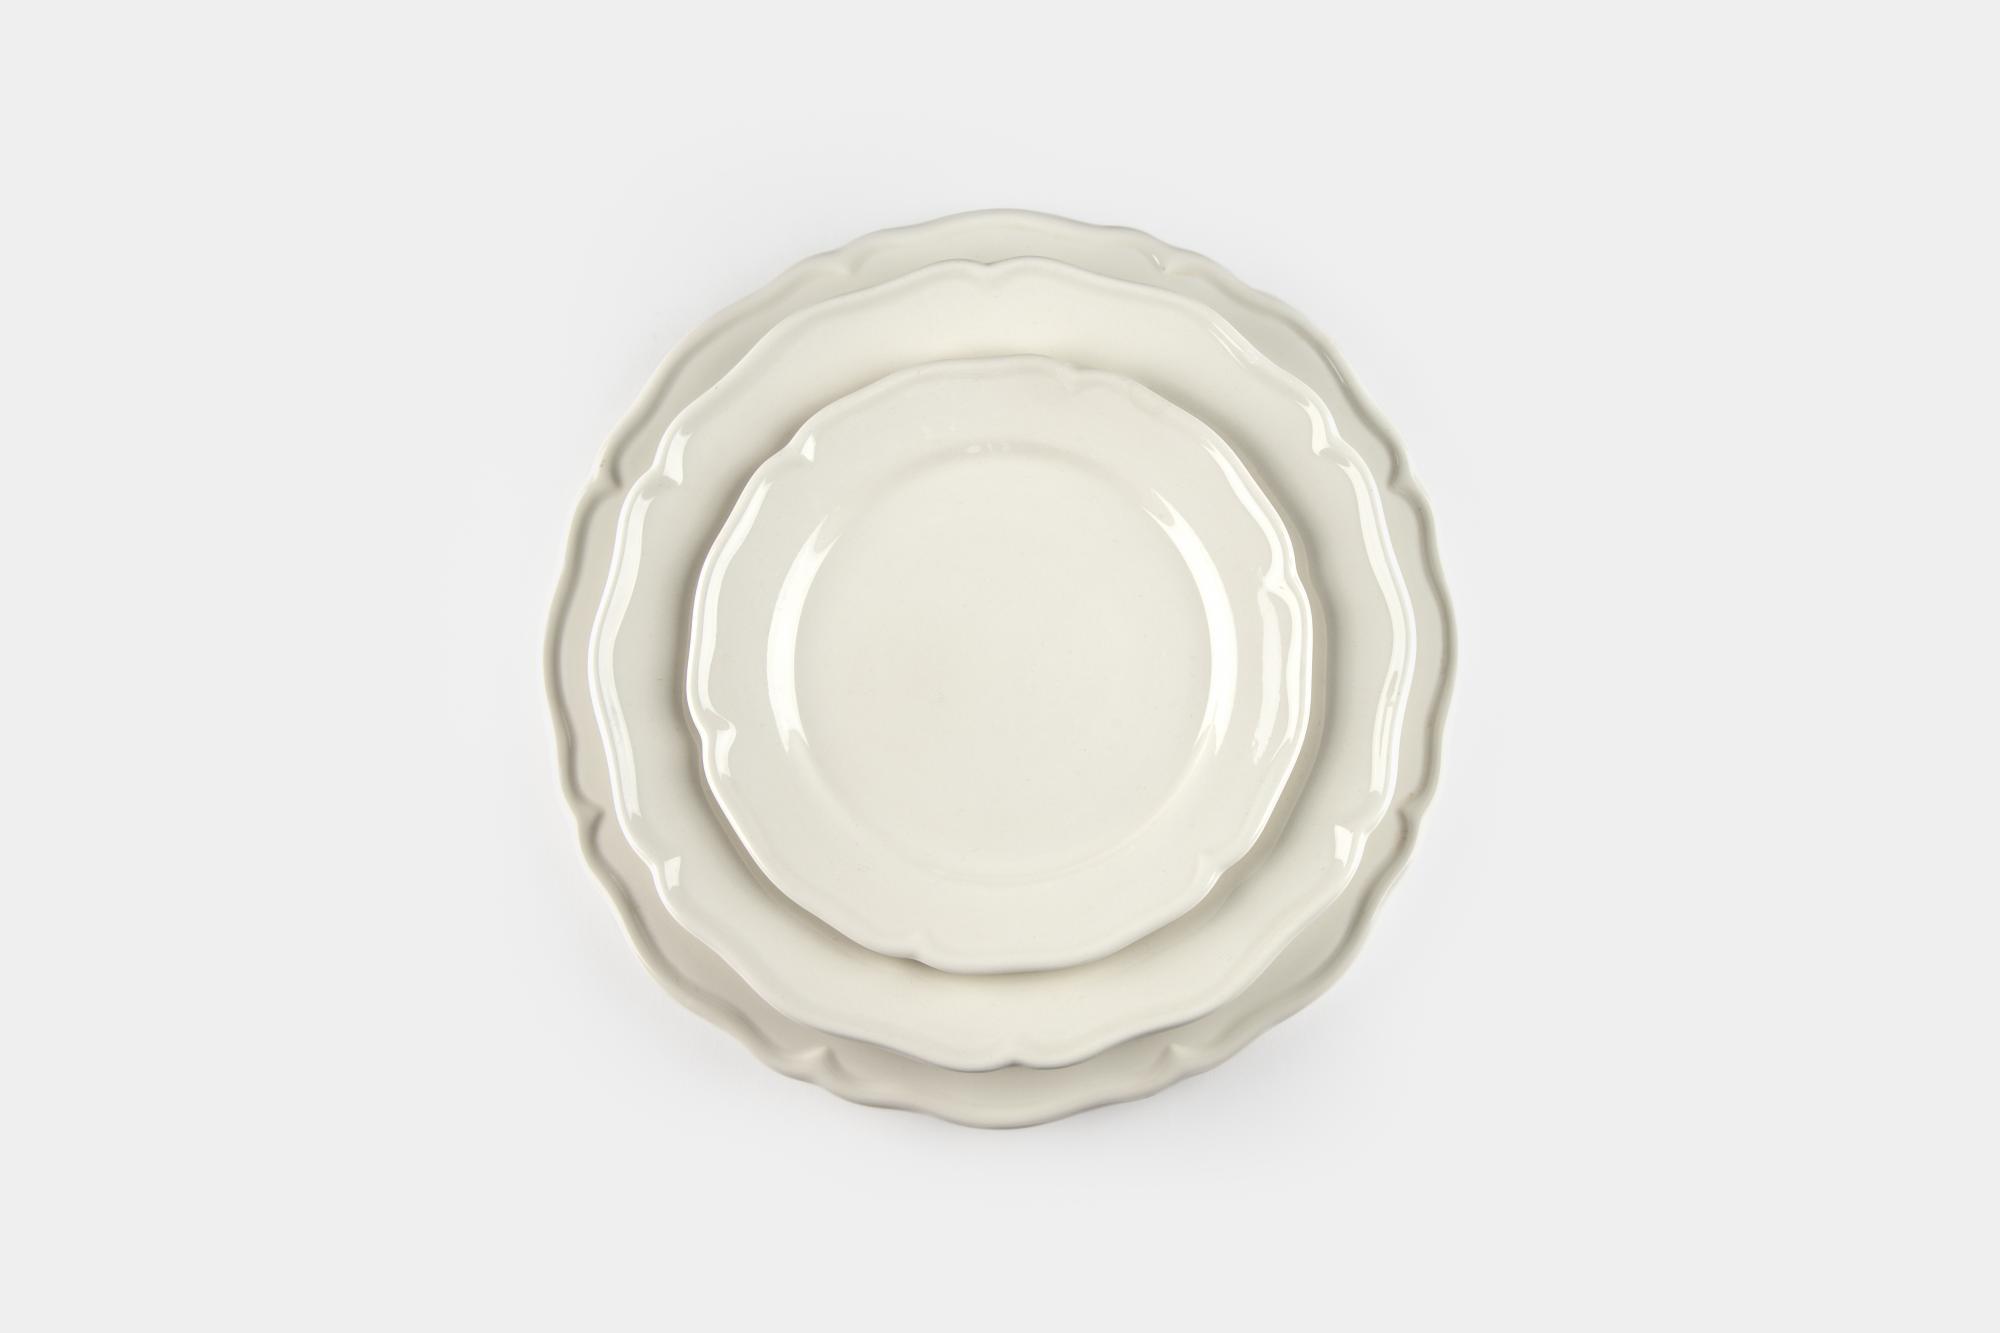 Bristol plate set - Image 3